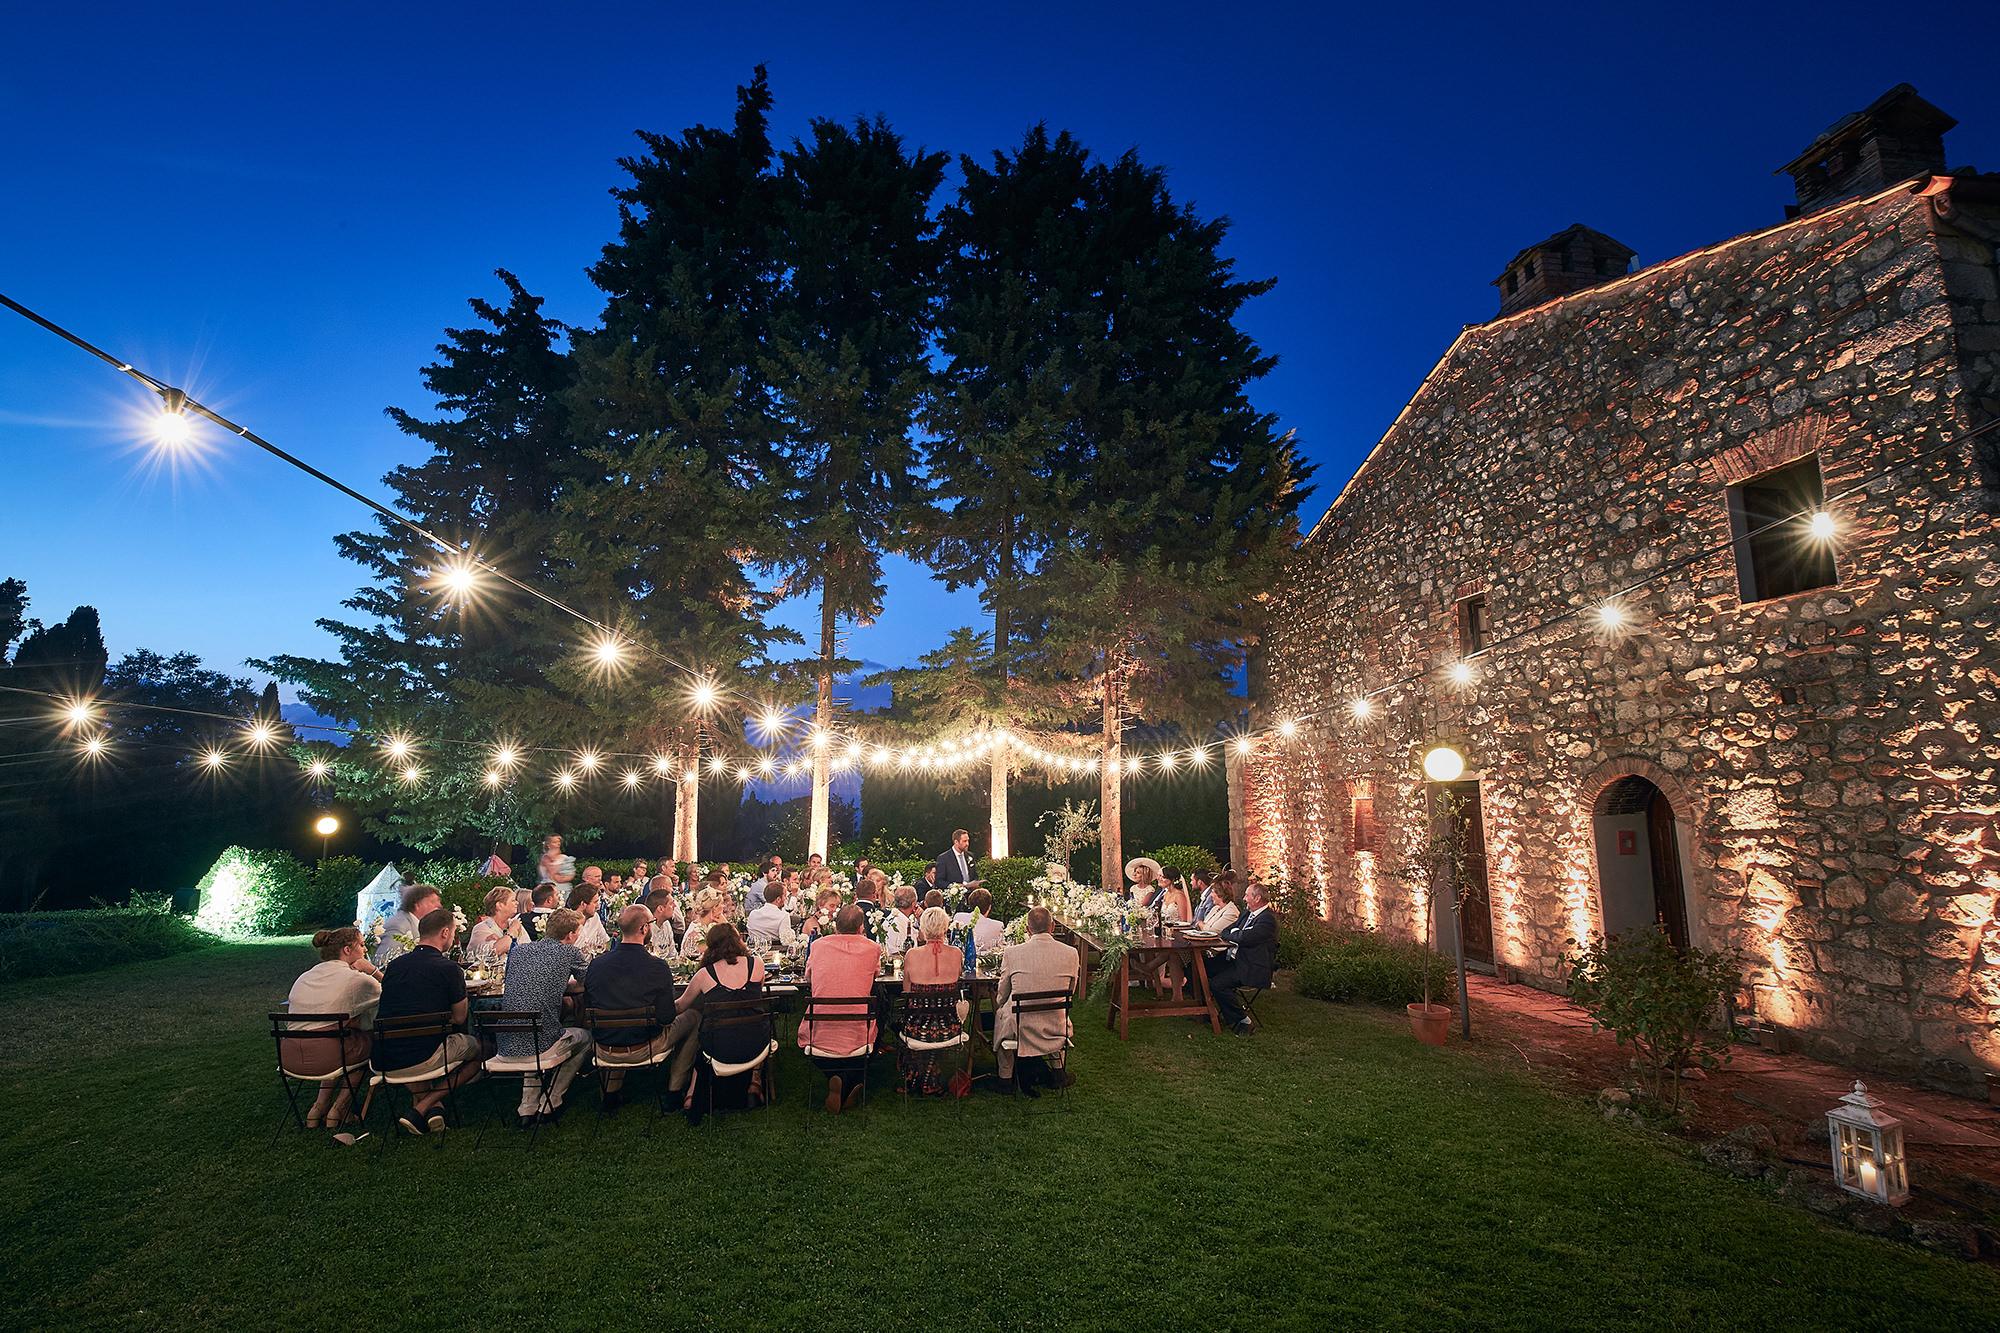 Rustico country wedding with illumination